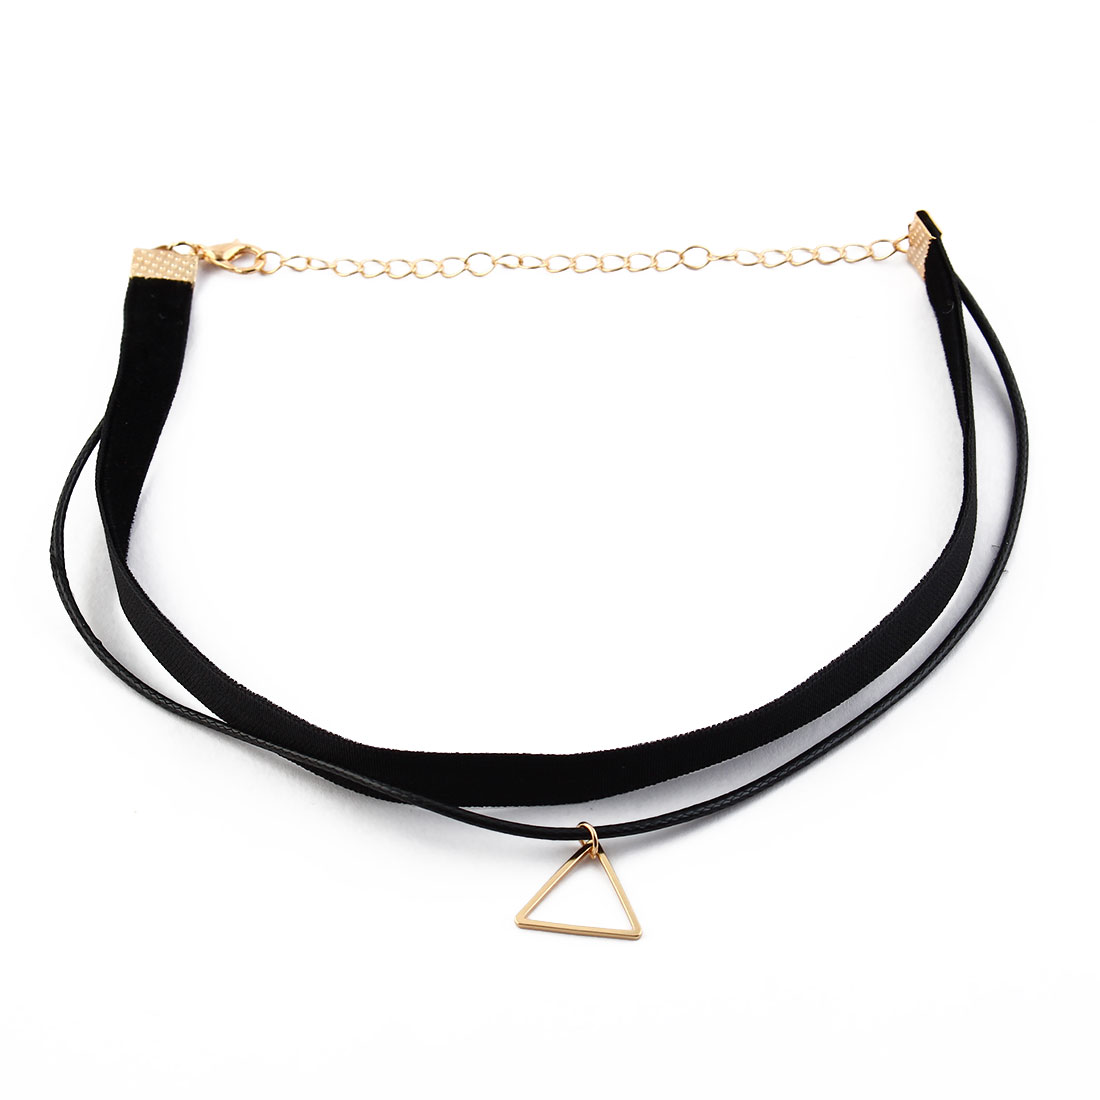 Women Ladies Faux Leather Triangle Pendant Adjustable Choker Necklace Neck Chain Black